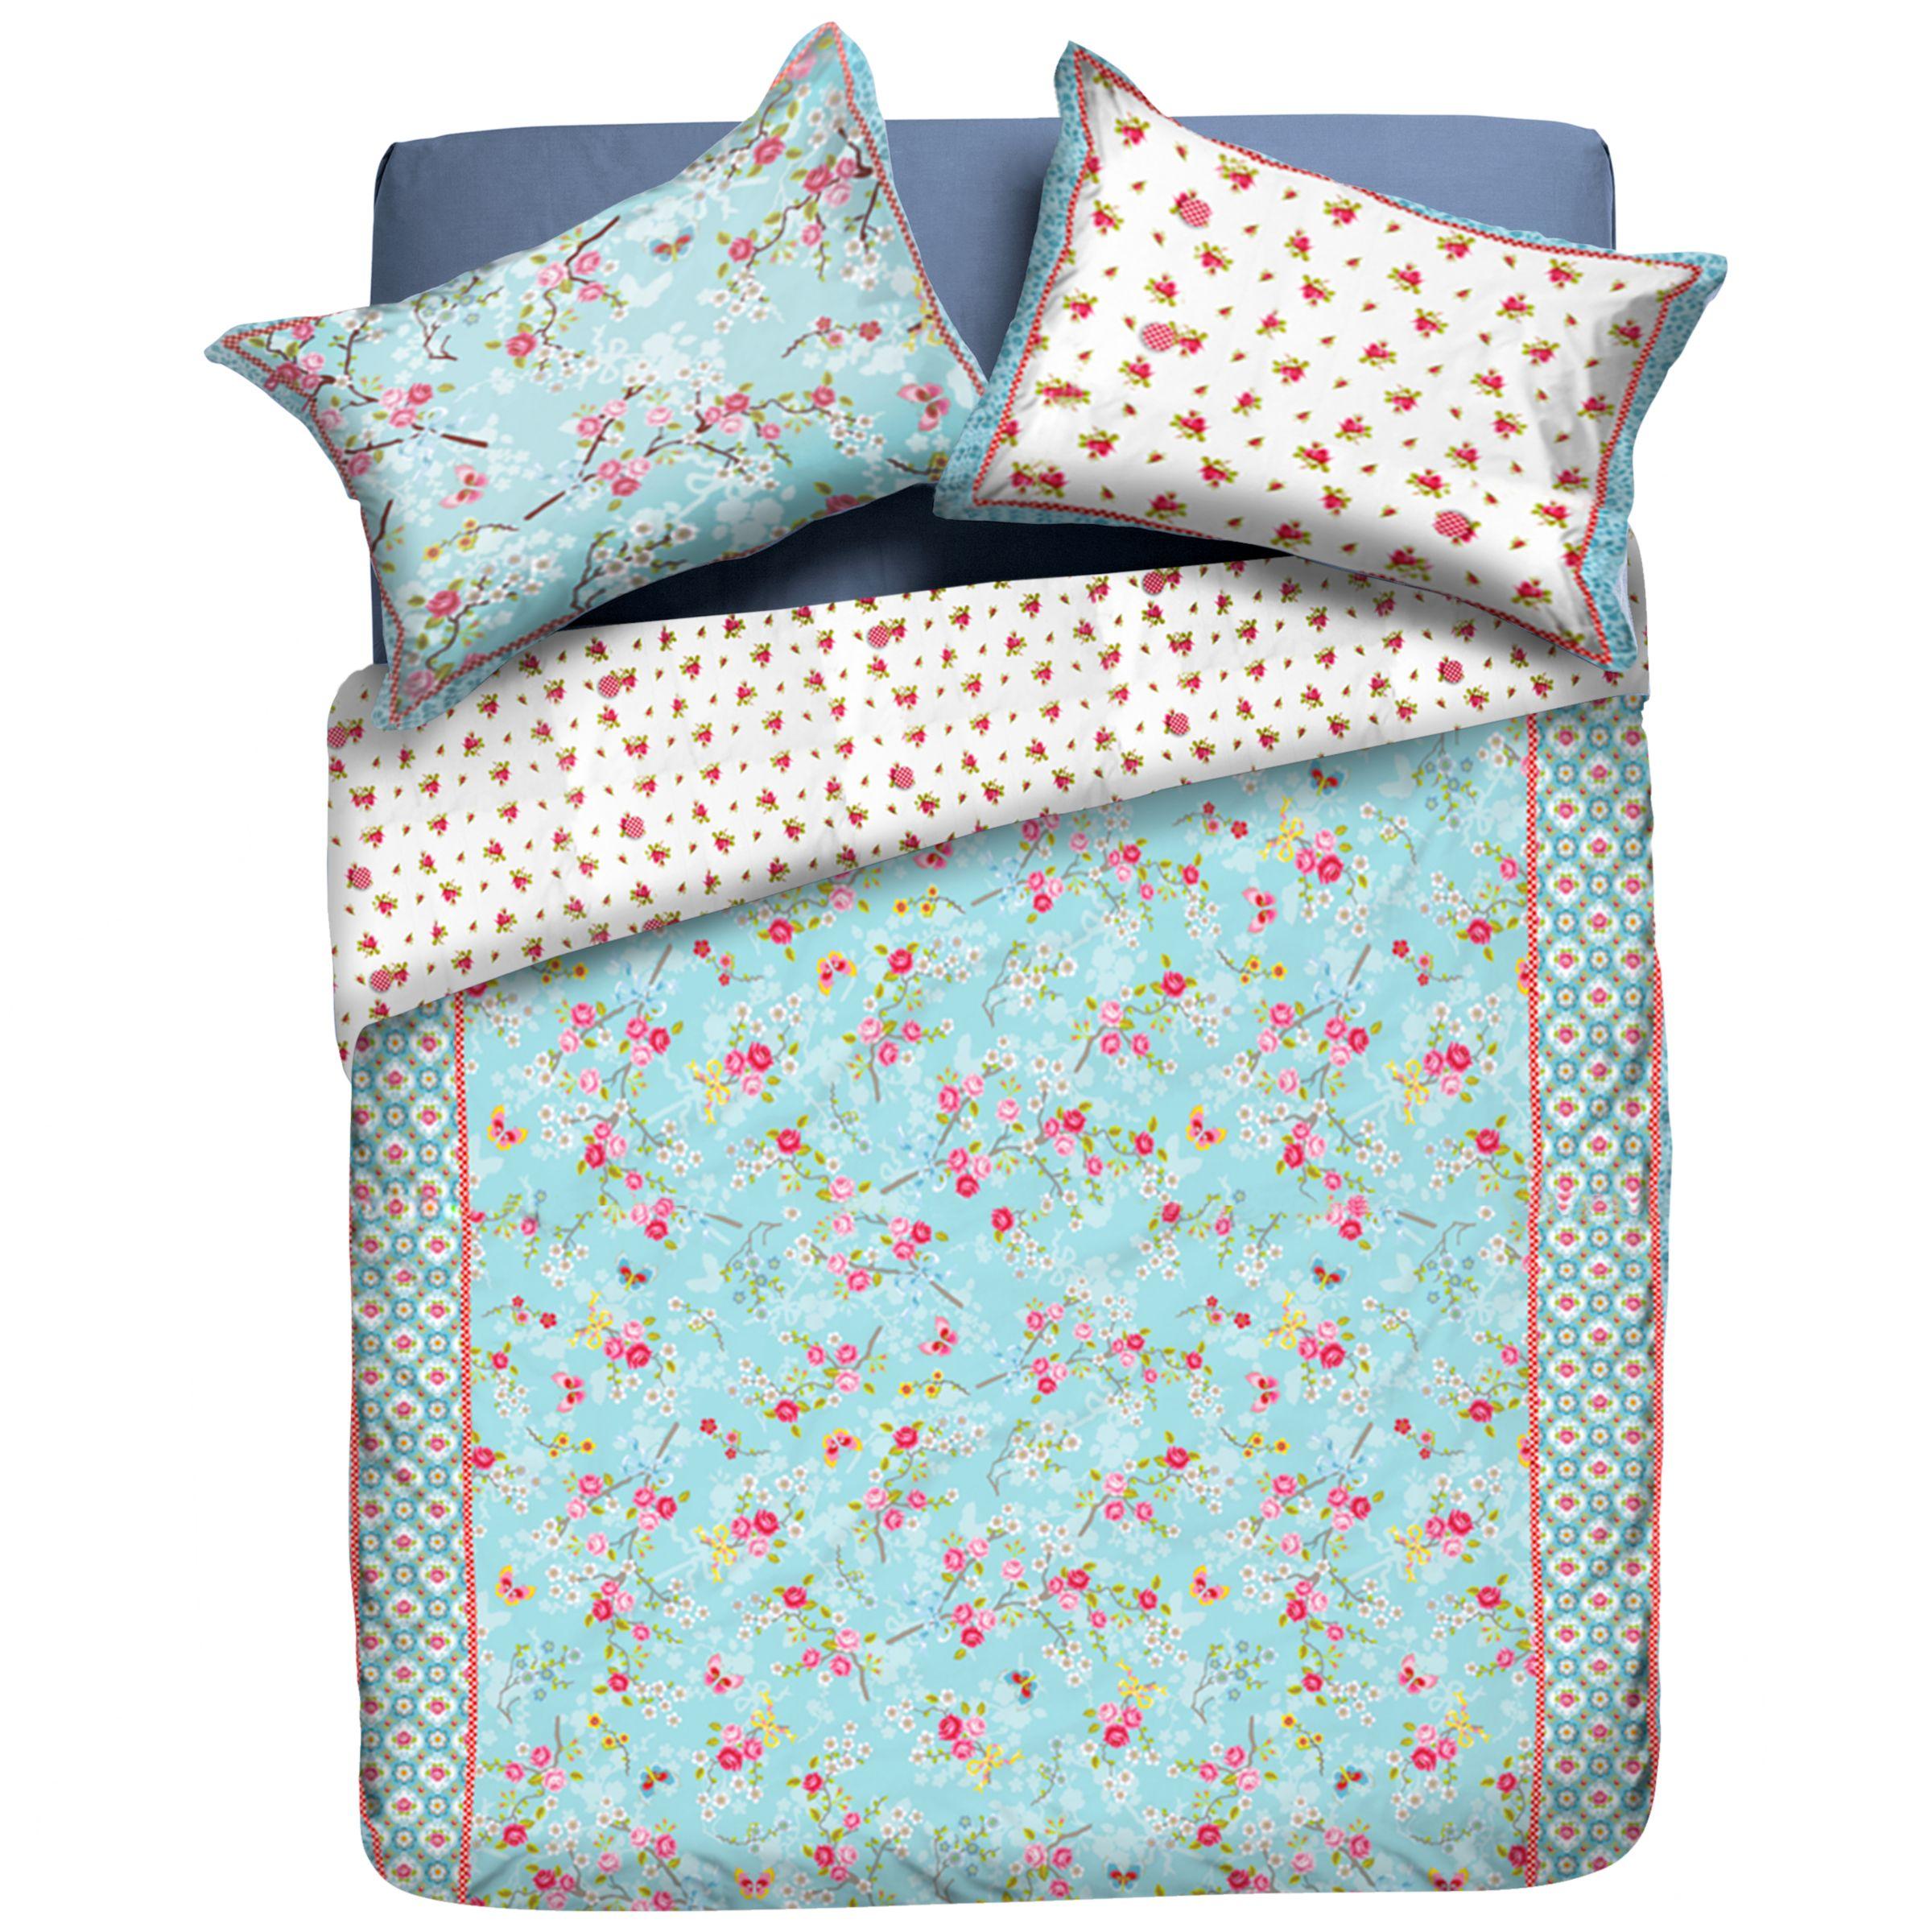 Pip Studio Chinese Blossom Duvet Cover And Pillowcase Set